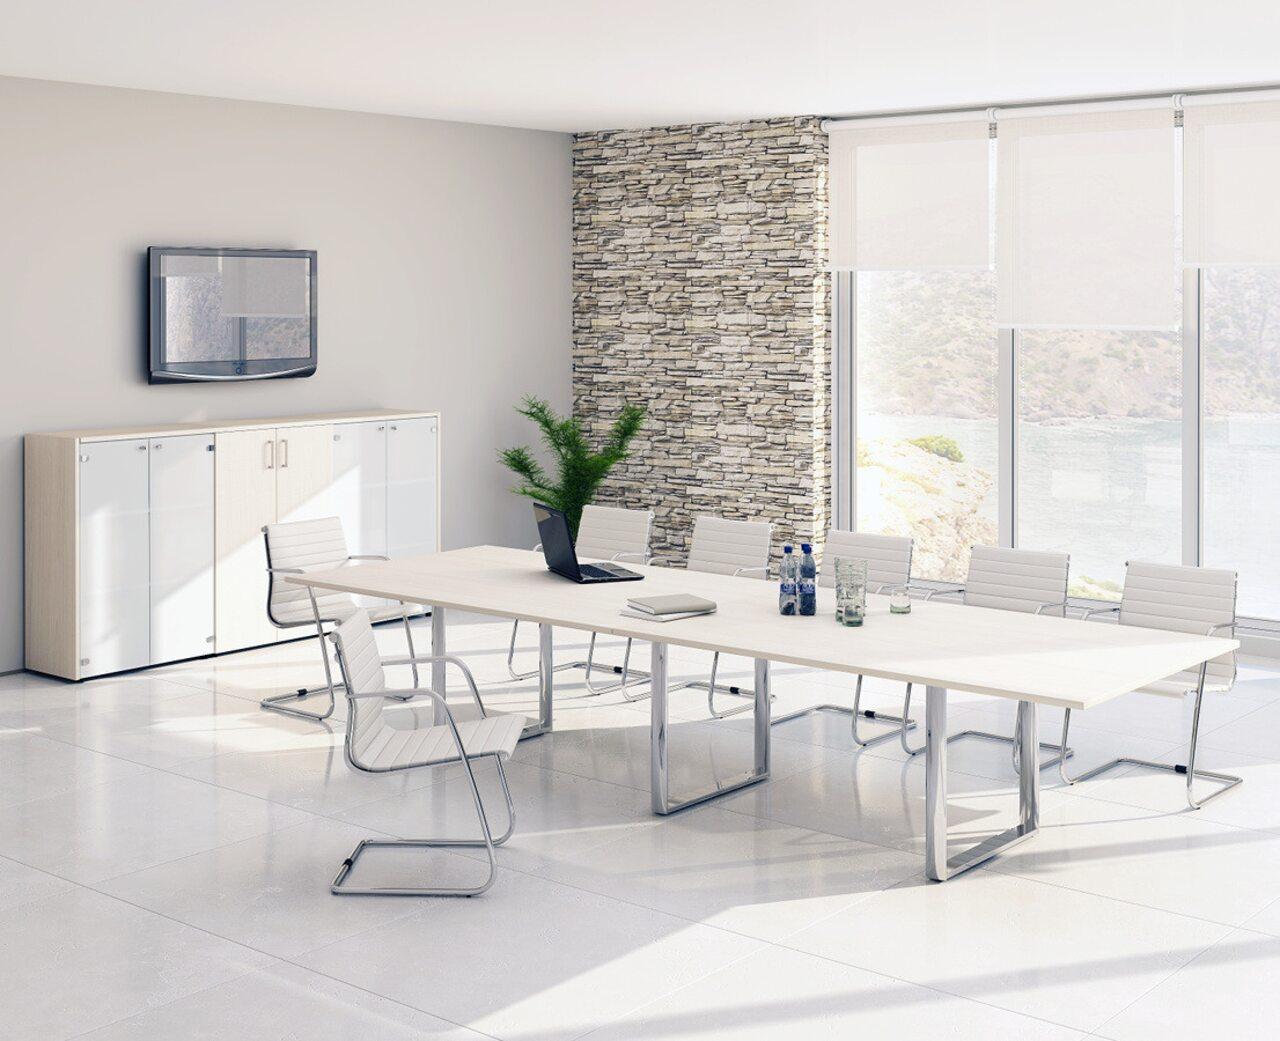 Стол для переговоров Orbis-Carre Meeting - фото 4